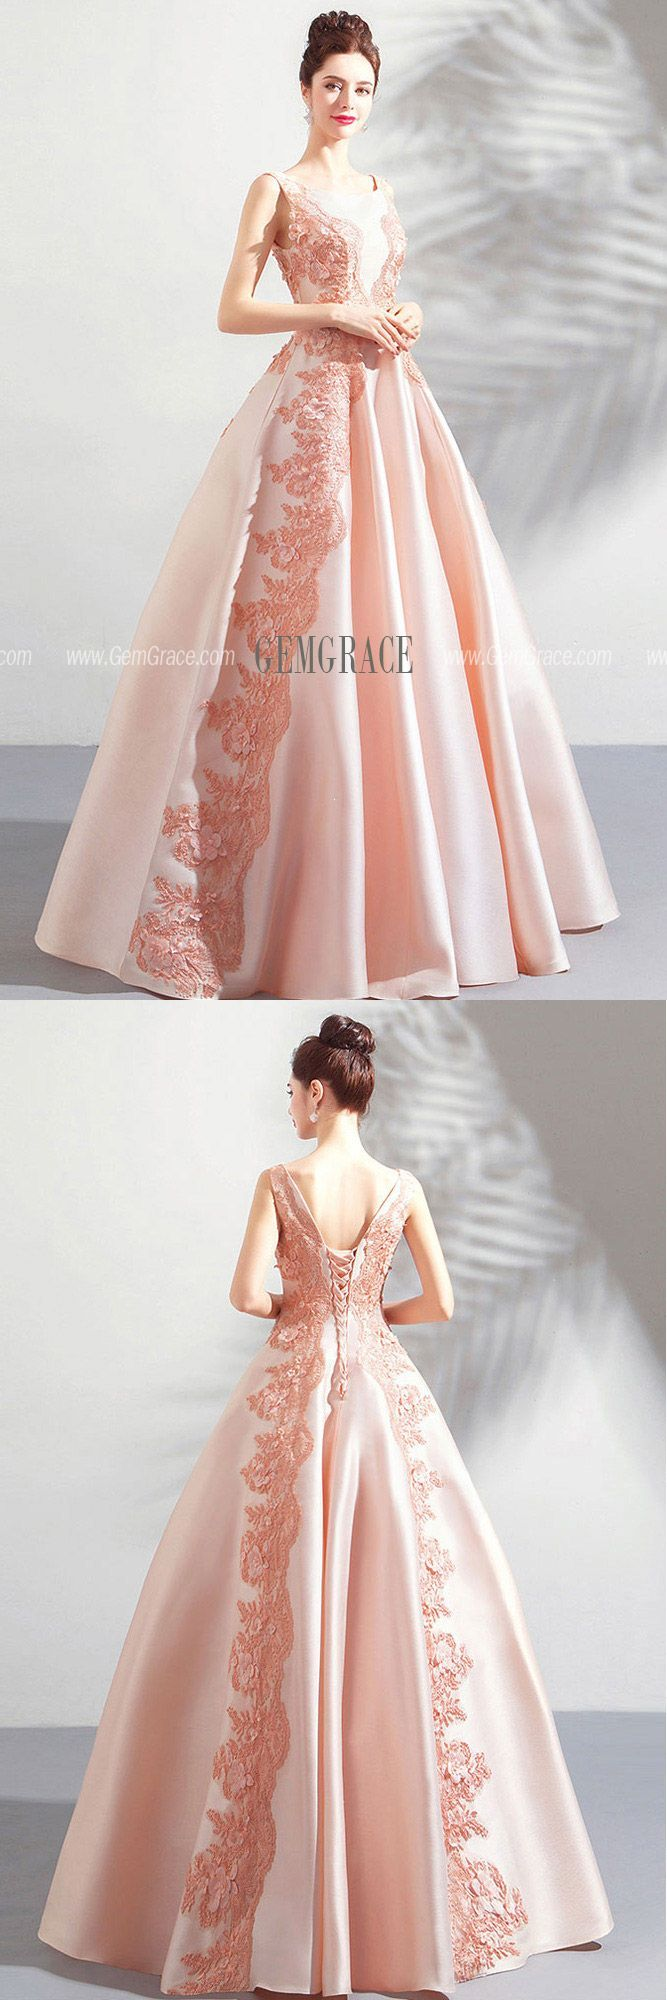 3263e13e092 Stunning Blush Pink Long Formal Satin Prom Dress Sleeveless  T69009 at  GemGrace.  2019